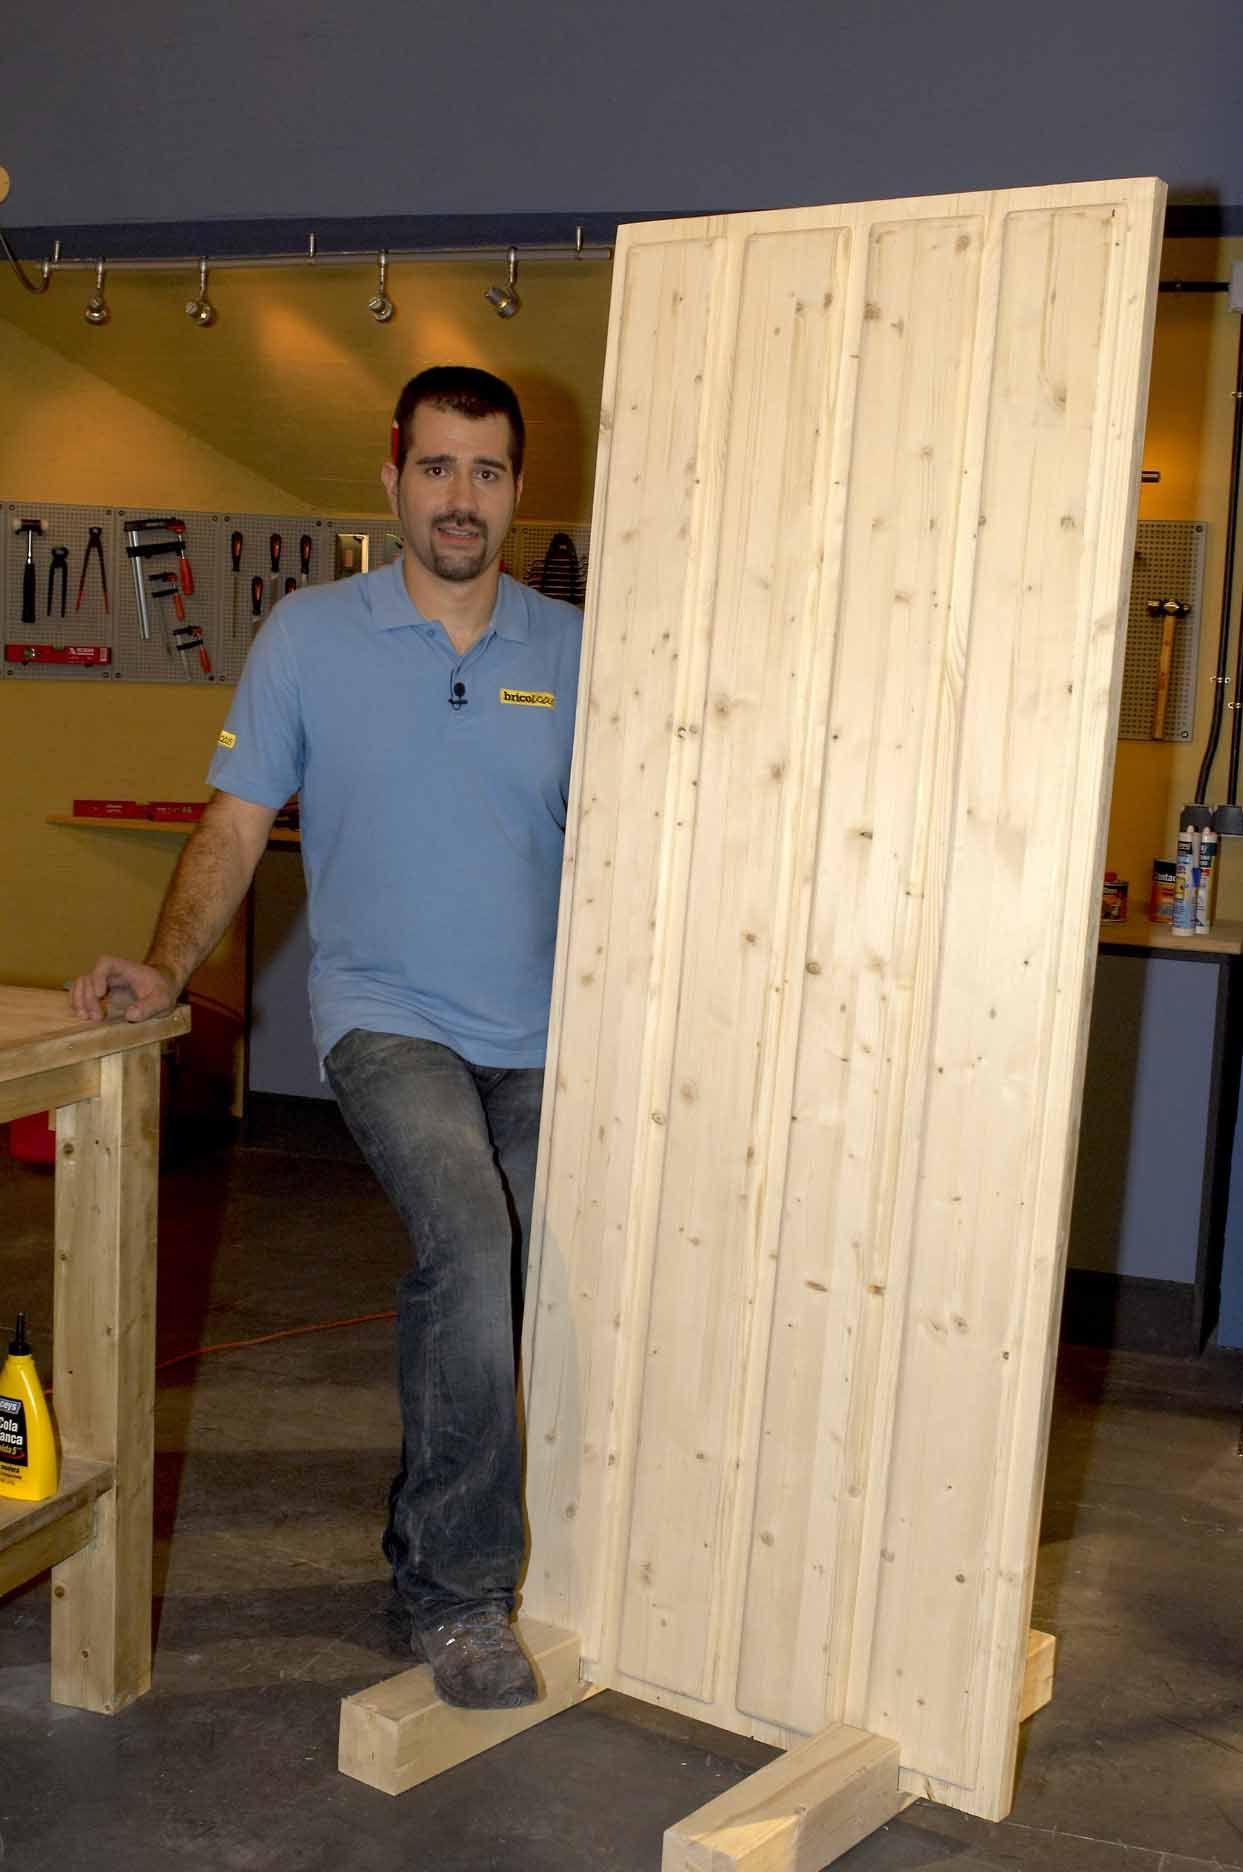 C mo hacer una puerta r stica de madera let 39 s do it for Puerta madera rustica